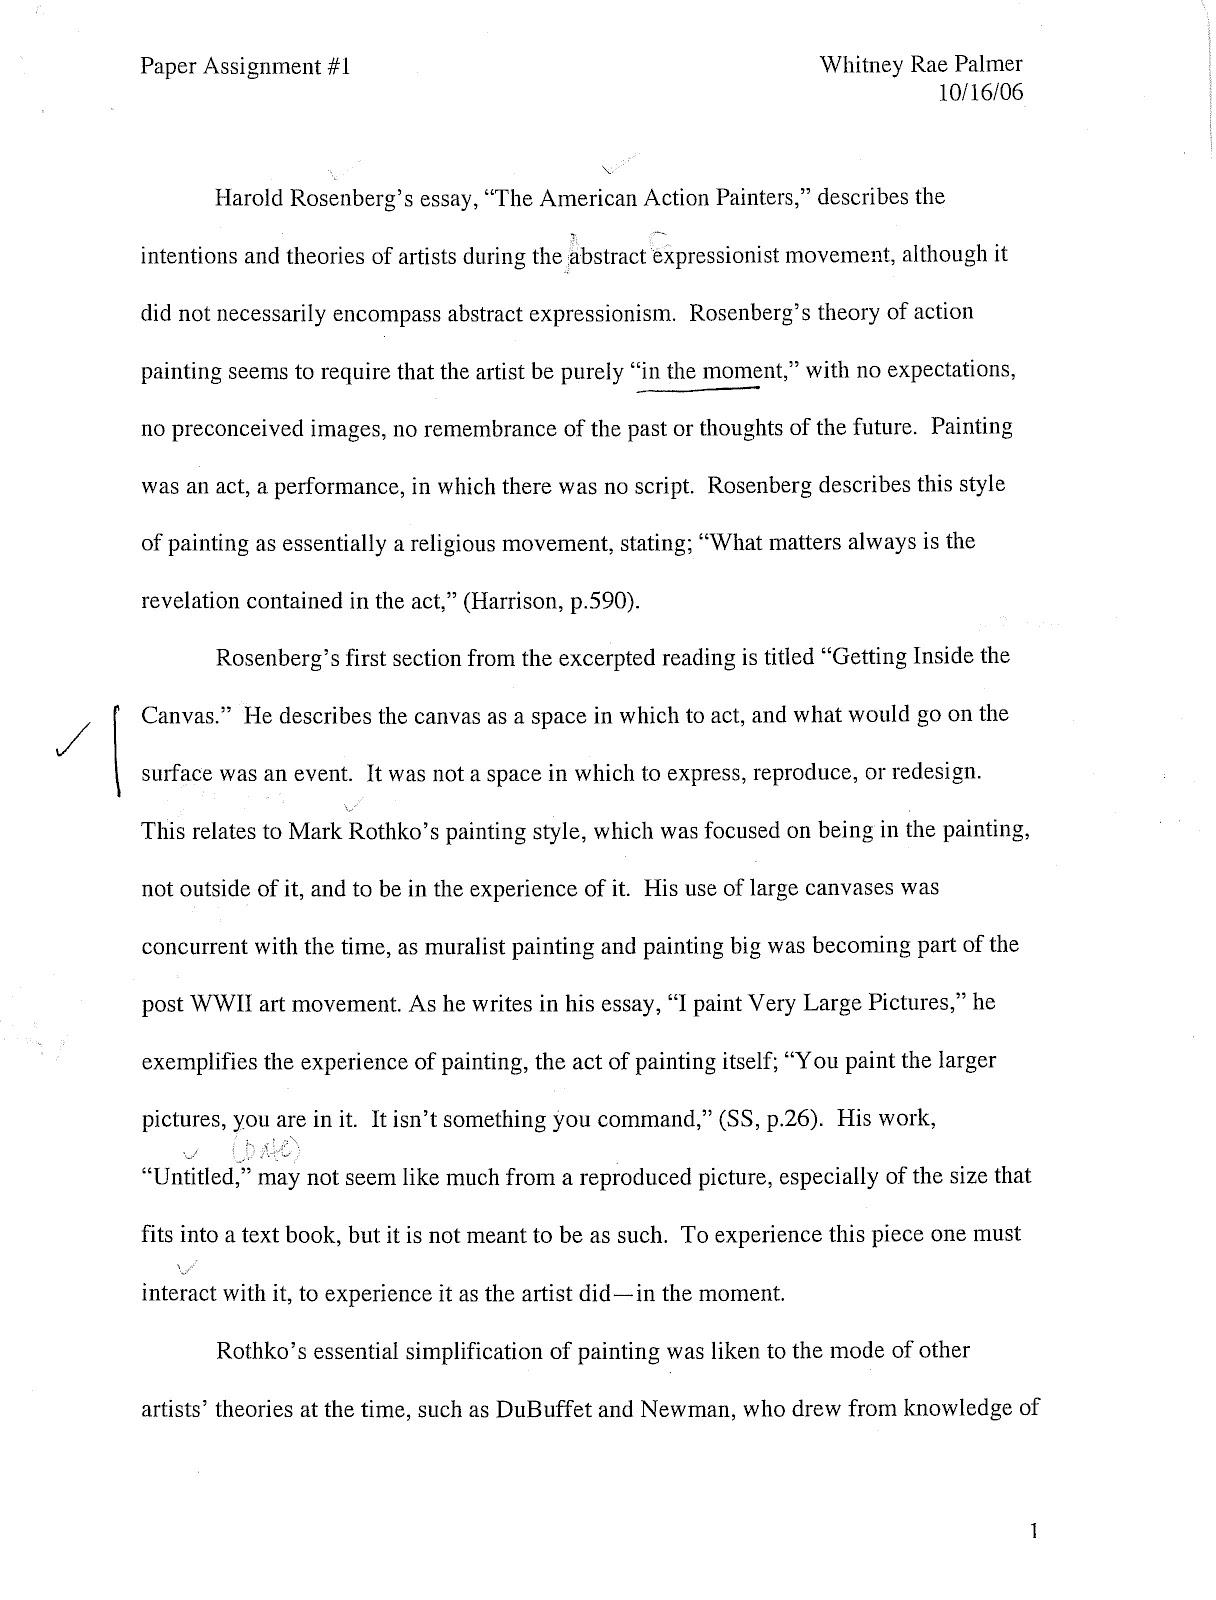 ww essay world war main causes essay dissertation methodology  hd image of ww2 essay topics argument essay topics persuasive argument essay